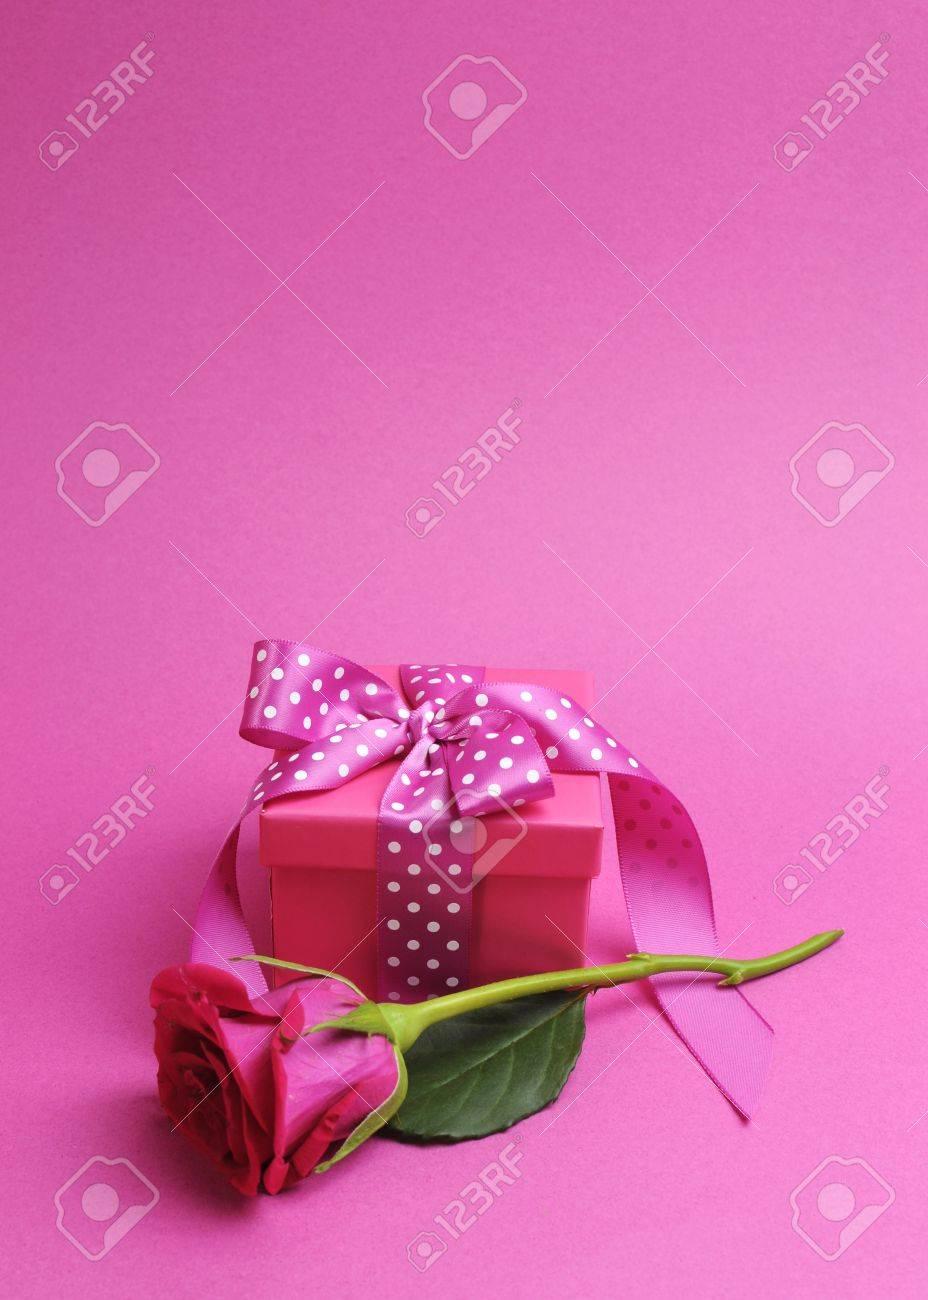 Pretty Pink Ribbon Pretty Pink Gift With Polka